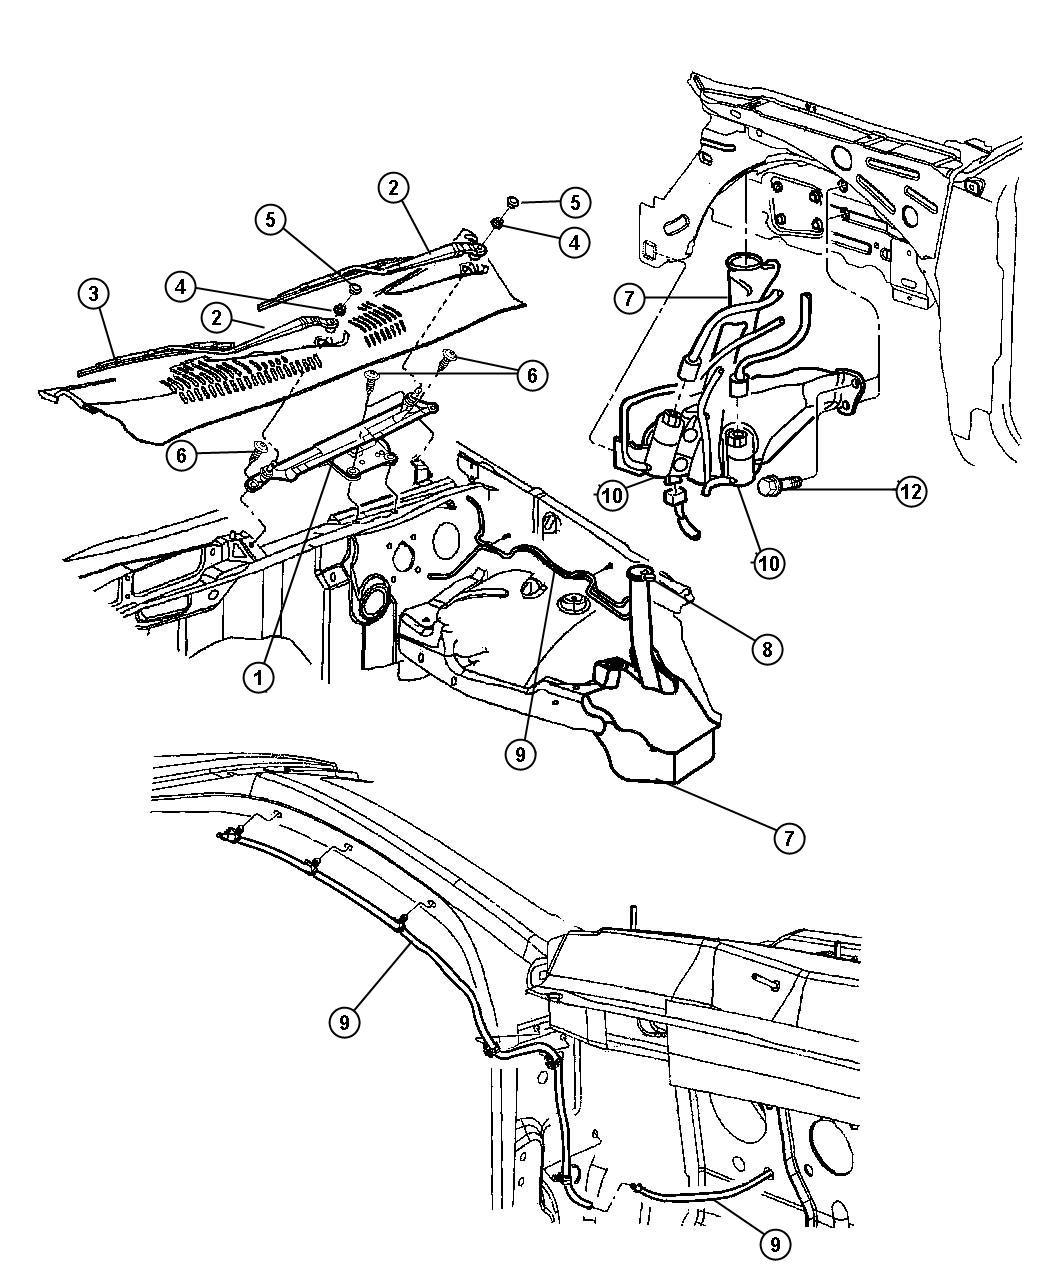 Used Kia Sportage Parts For Sale Interior Diagram